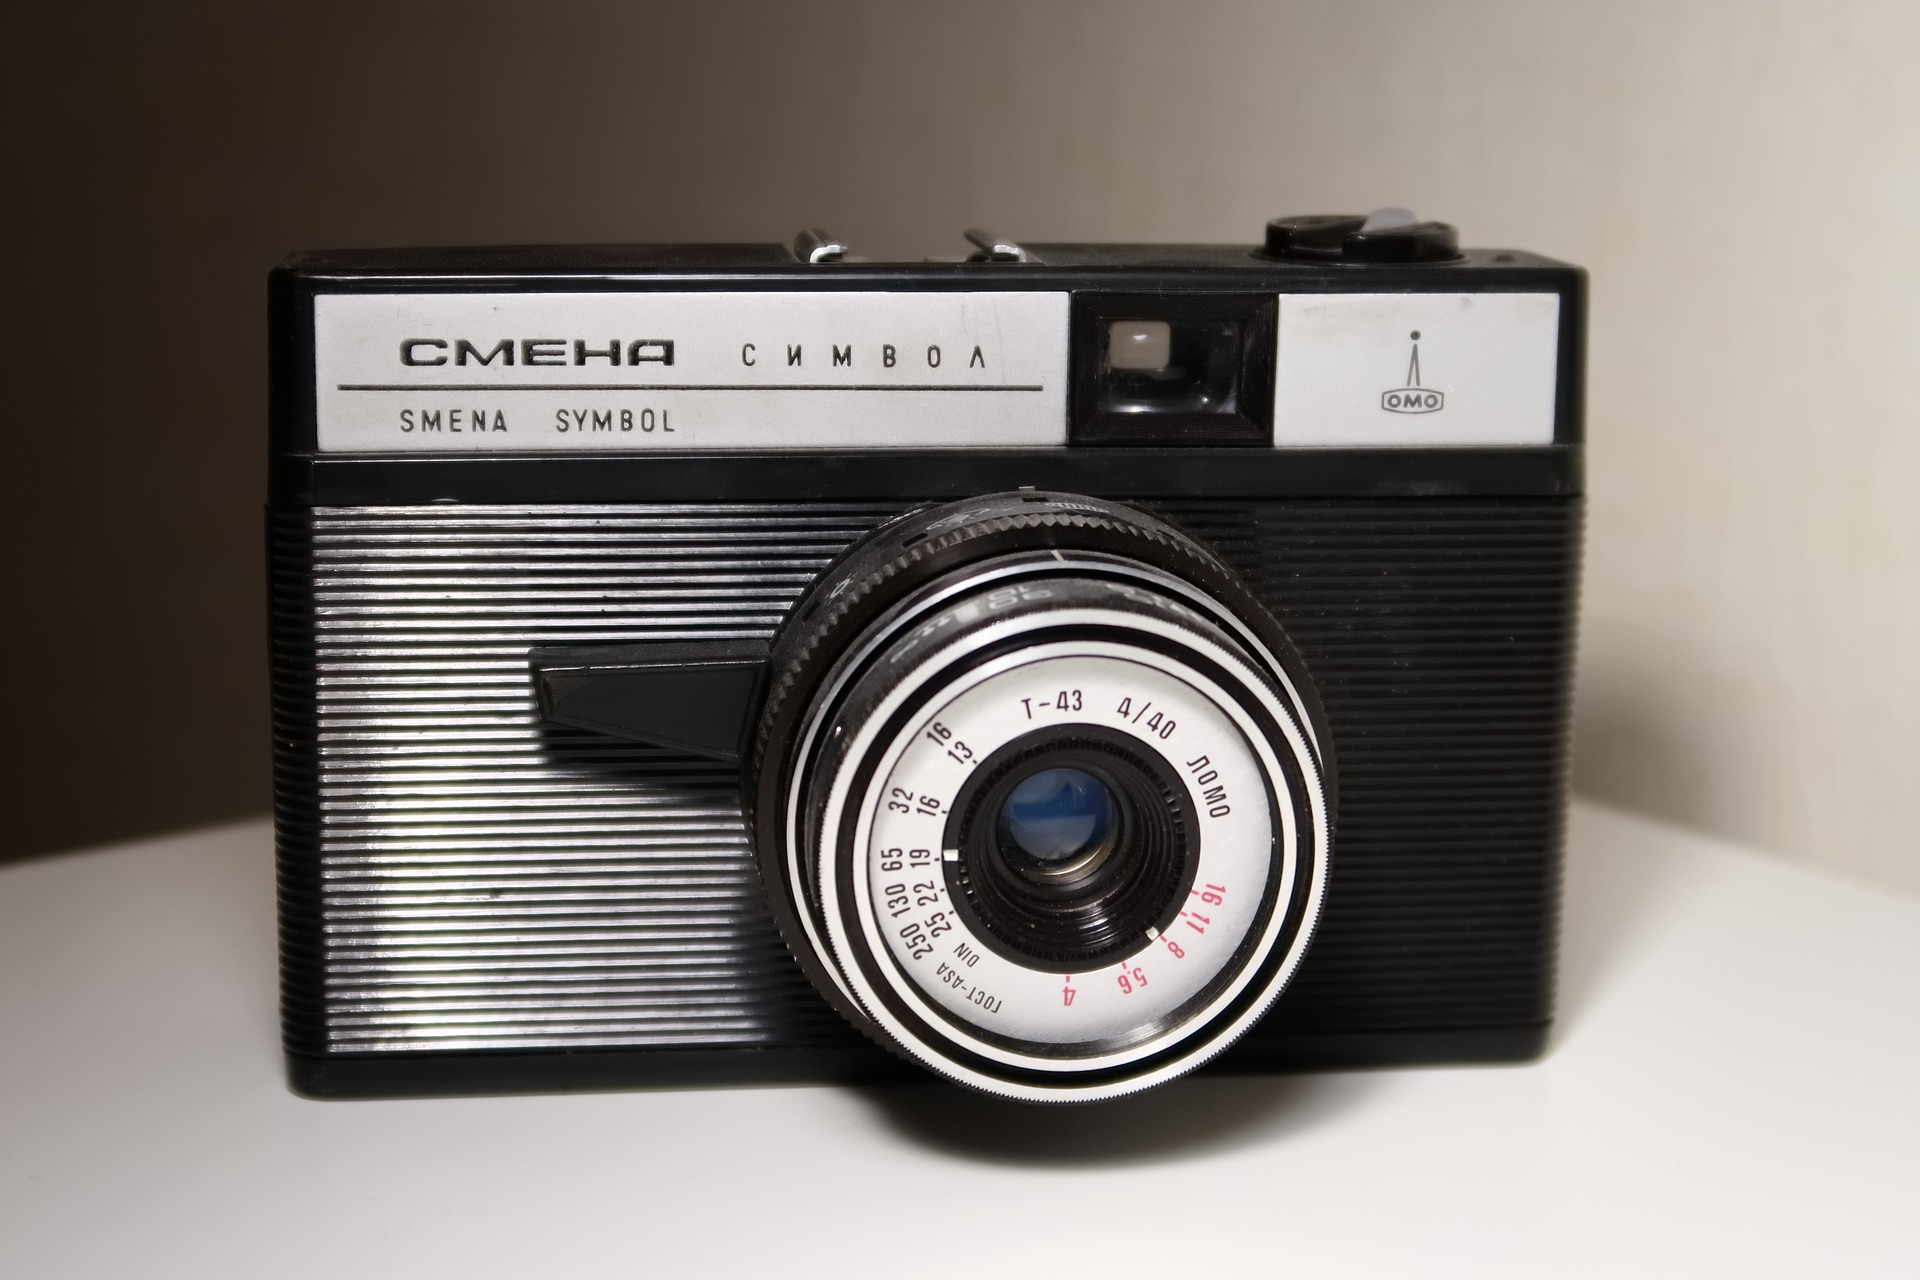 Smena Symbol camera (Pic: Ruspron71/Pixabay)